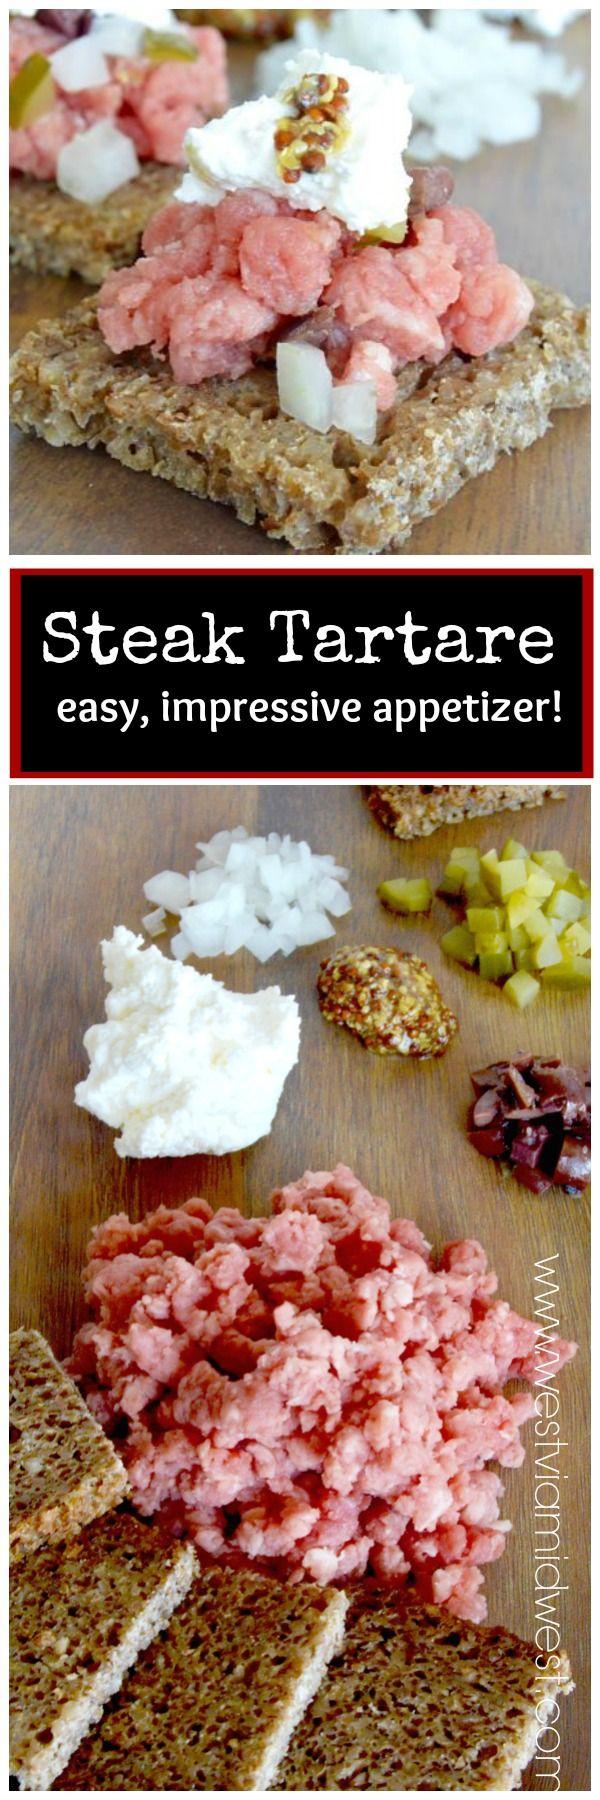 Steak tartare, Steaks and Fresh on Pinterest